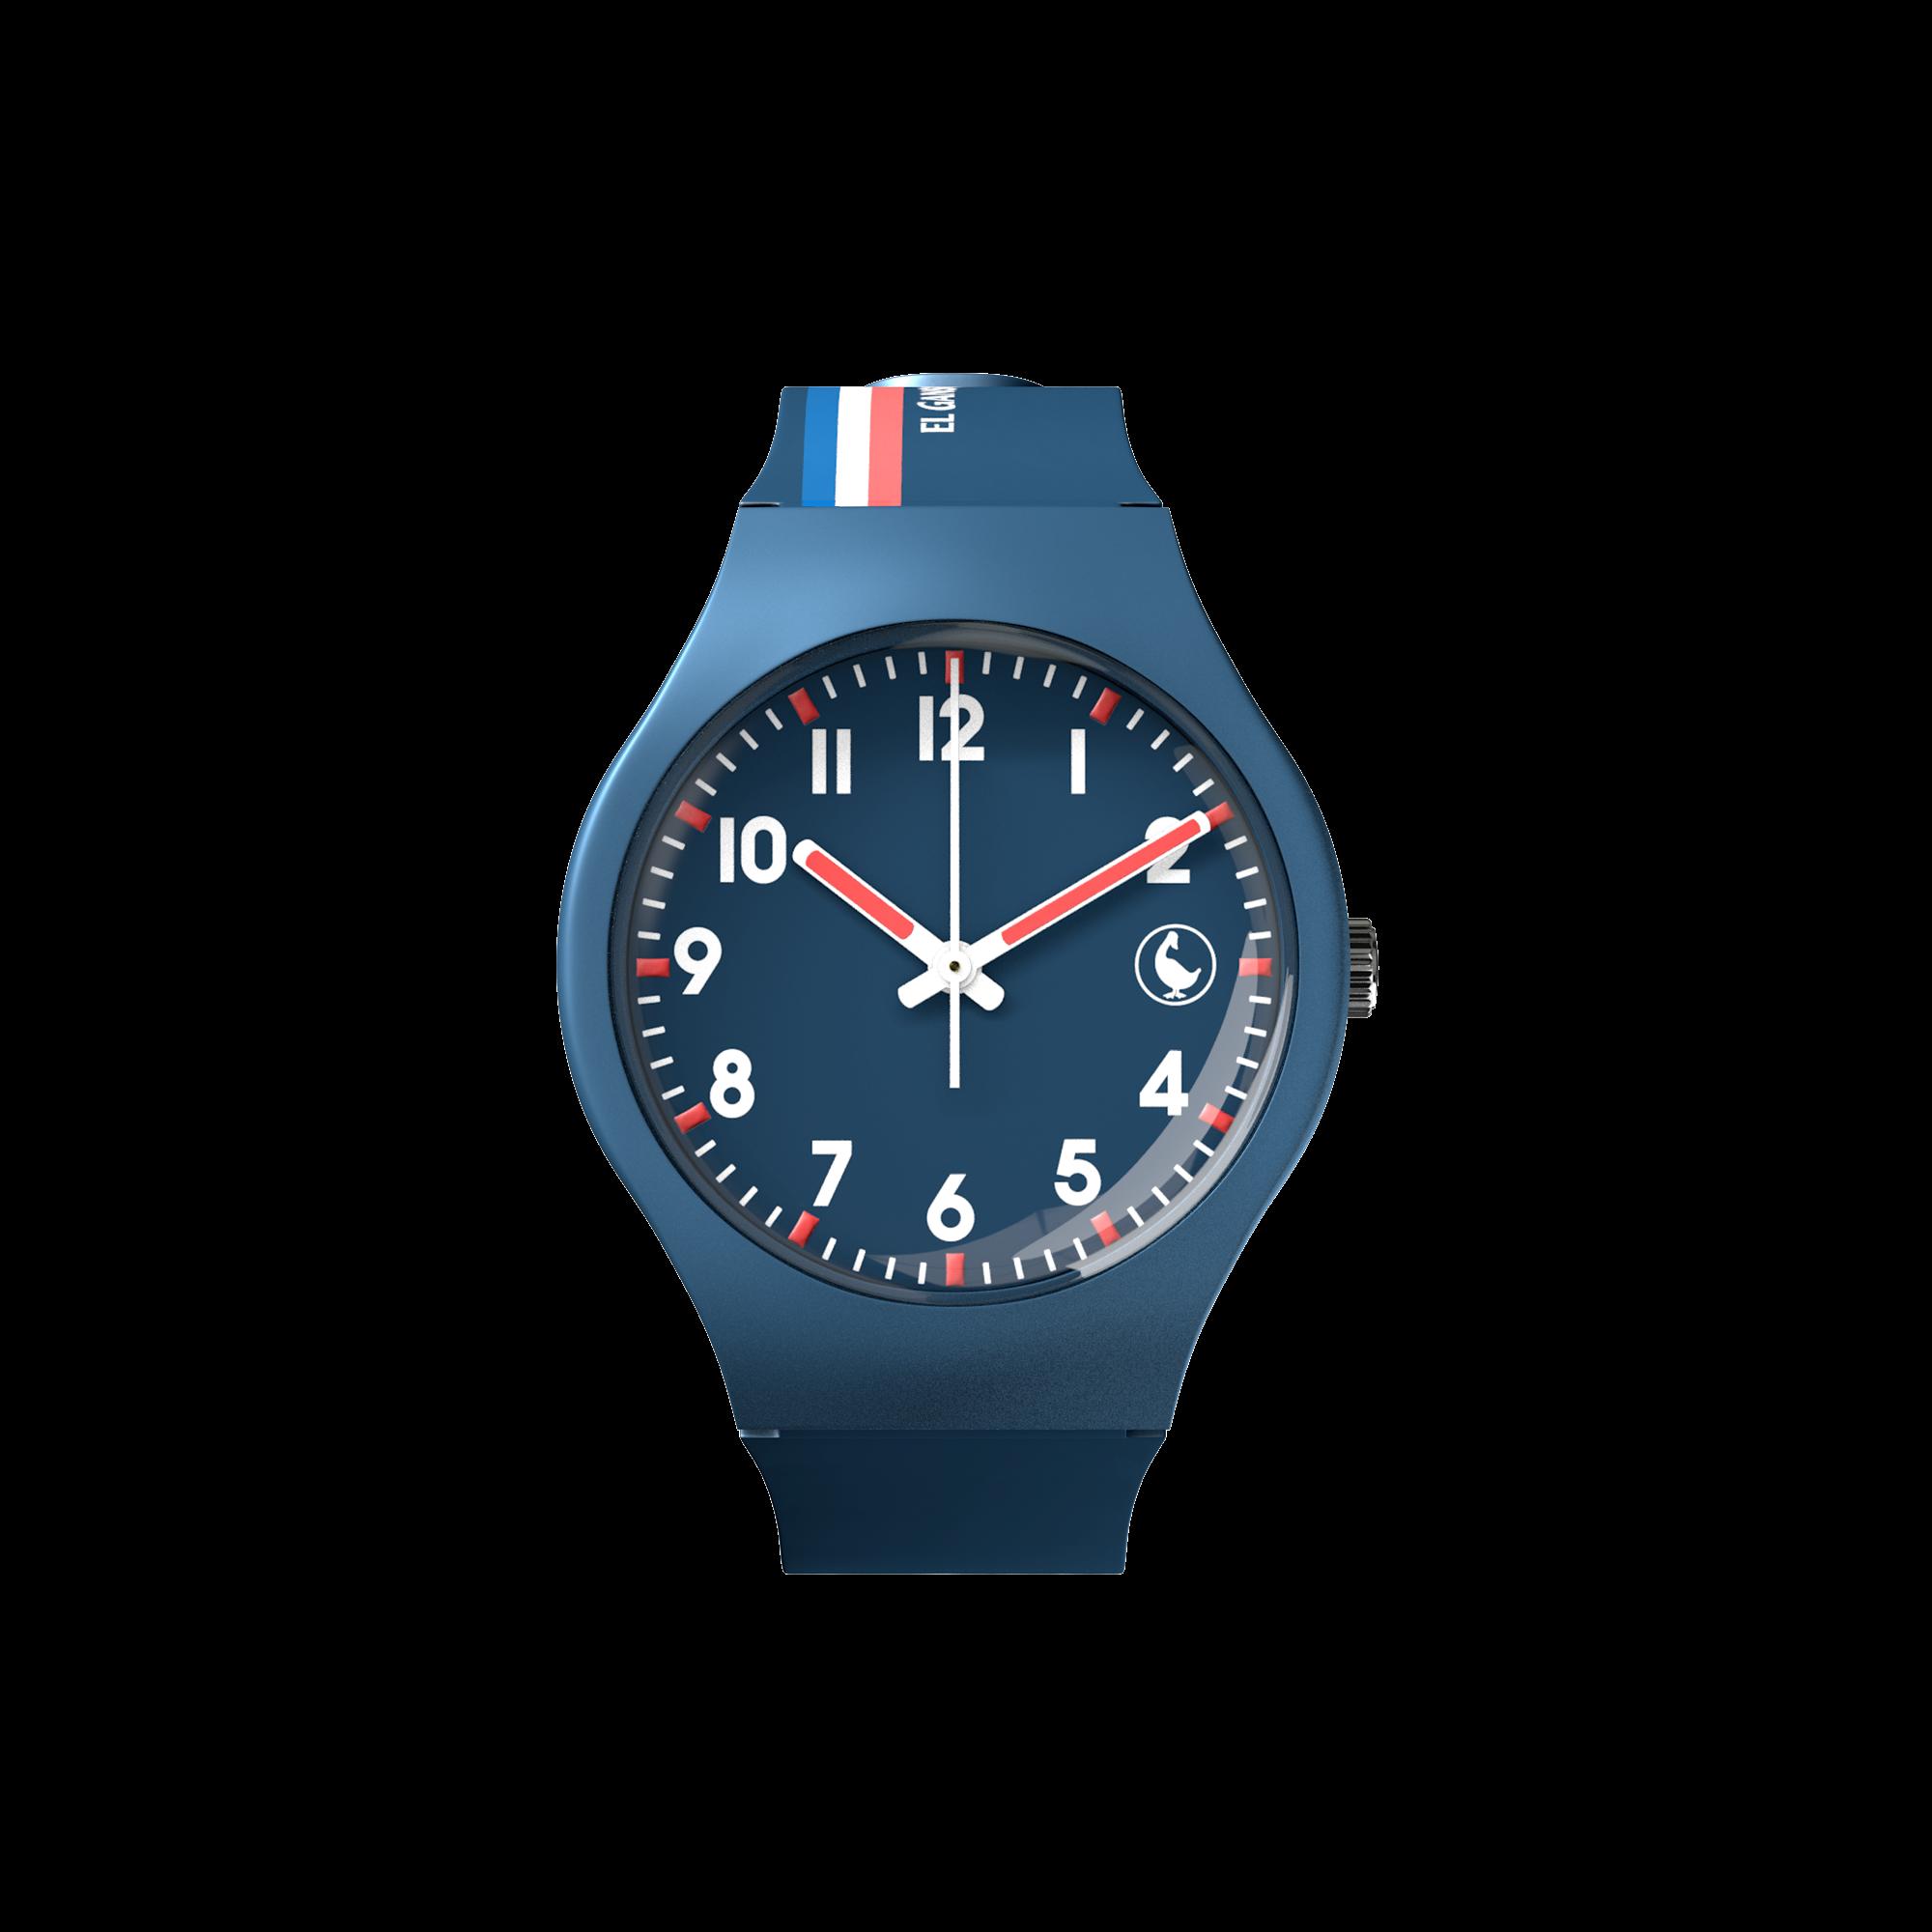 Reloj Ganso Azul Image 1